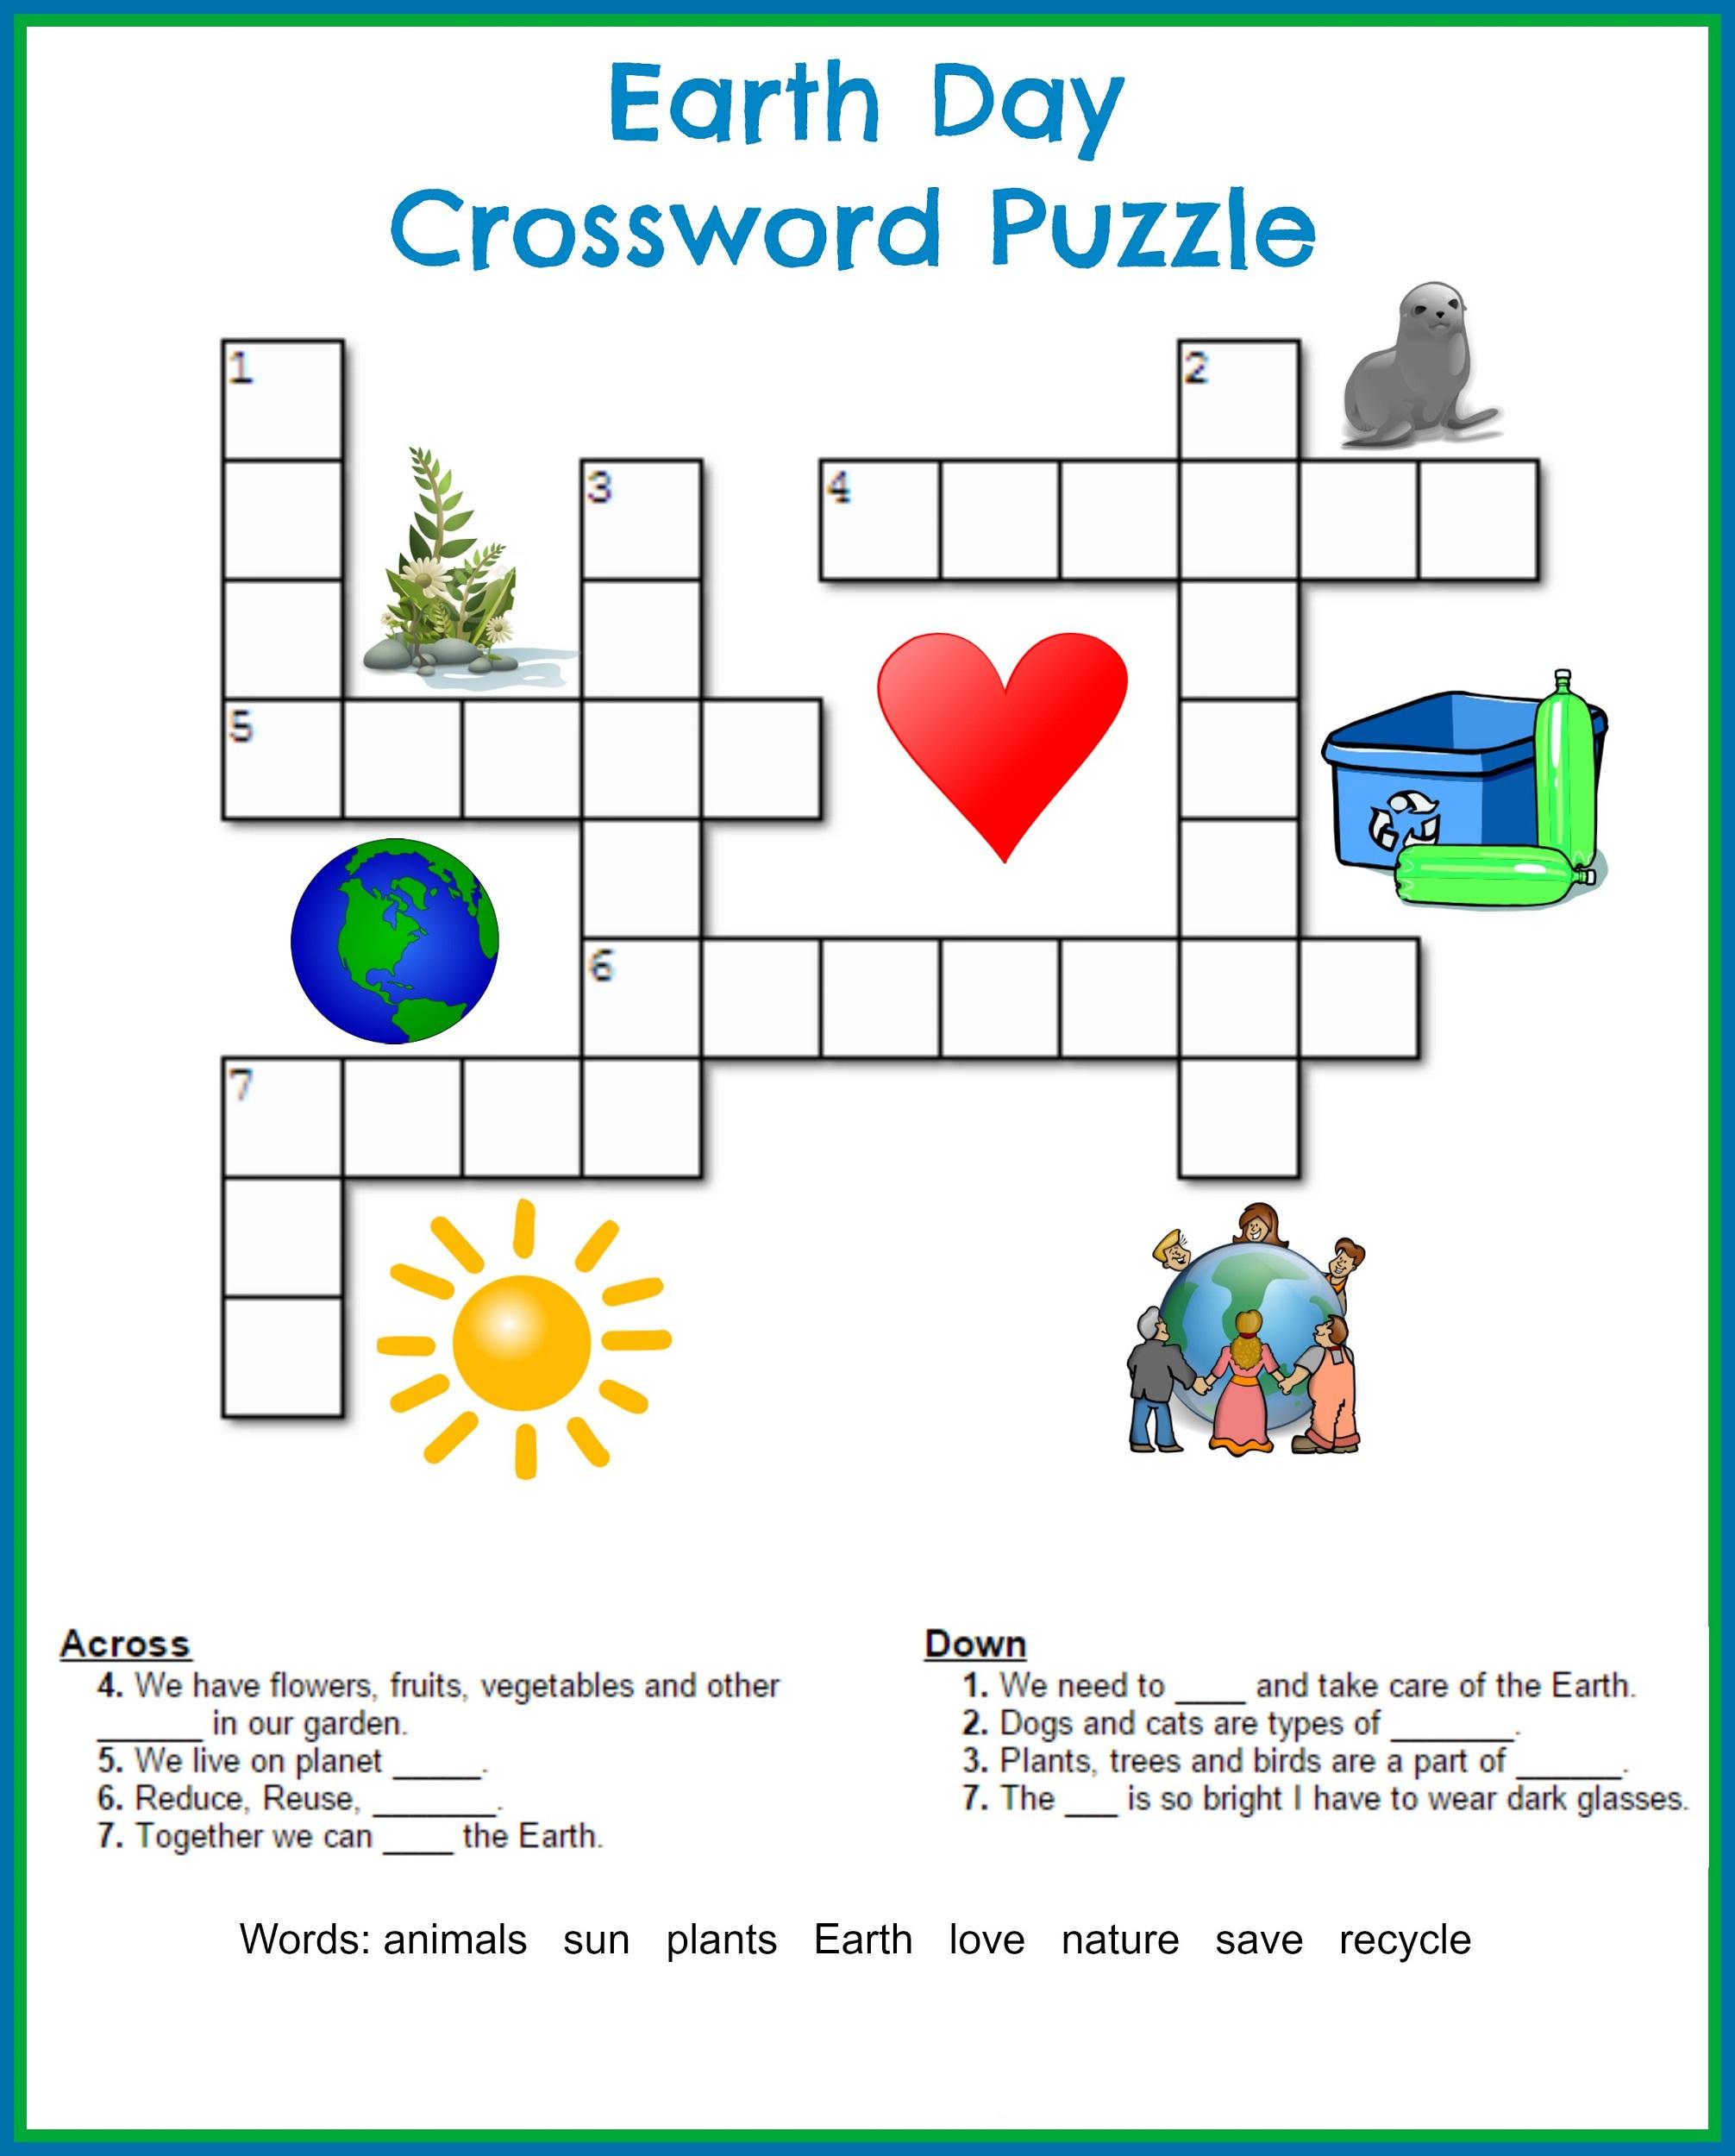 Printable Crosswords Puzzles Kids | Activity Shelter - Printable Crossword Puzzles For Kids With Word Bank